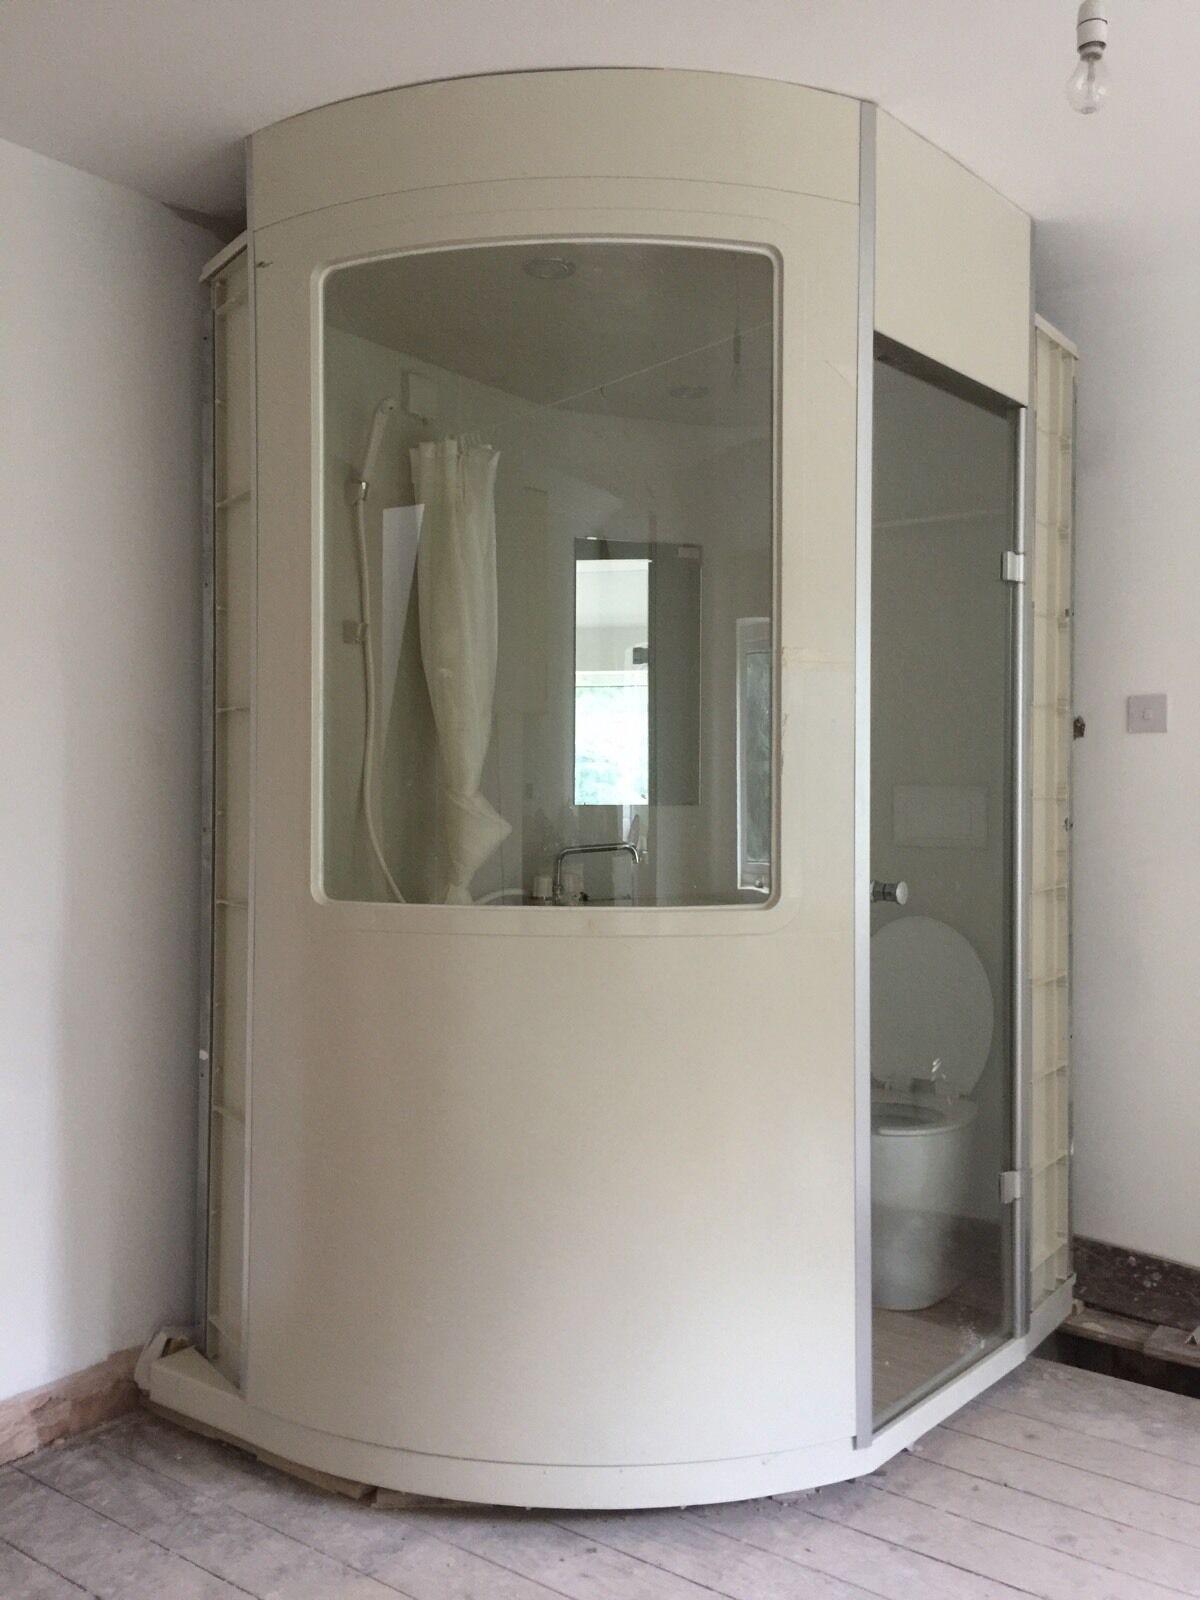 Bathroom pods prefabricated capsules modular en suites for Bathroom 00